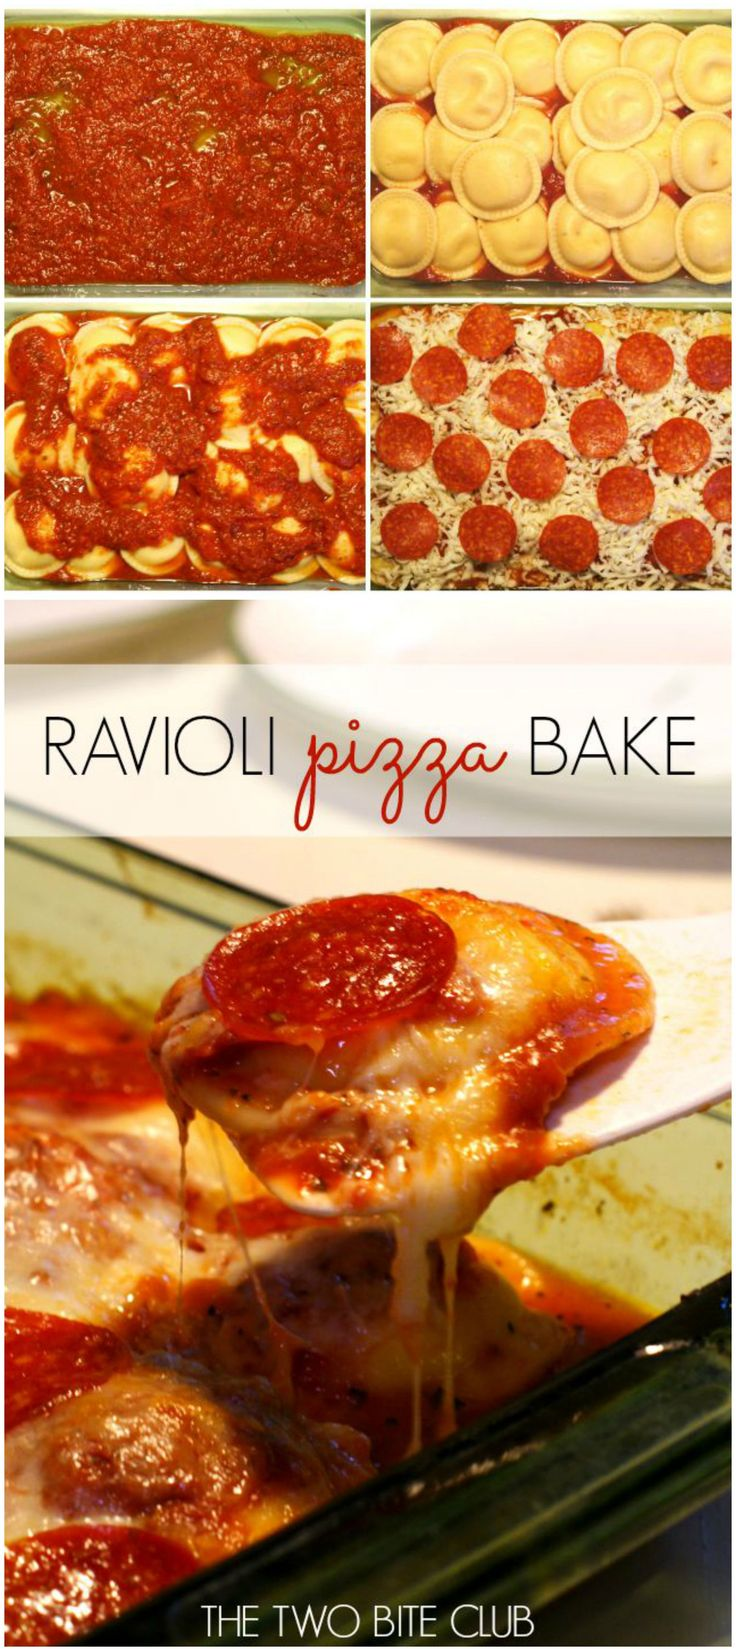 Ravioli Pizza Bake | thetwobiteclub.com